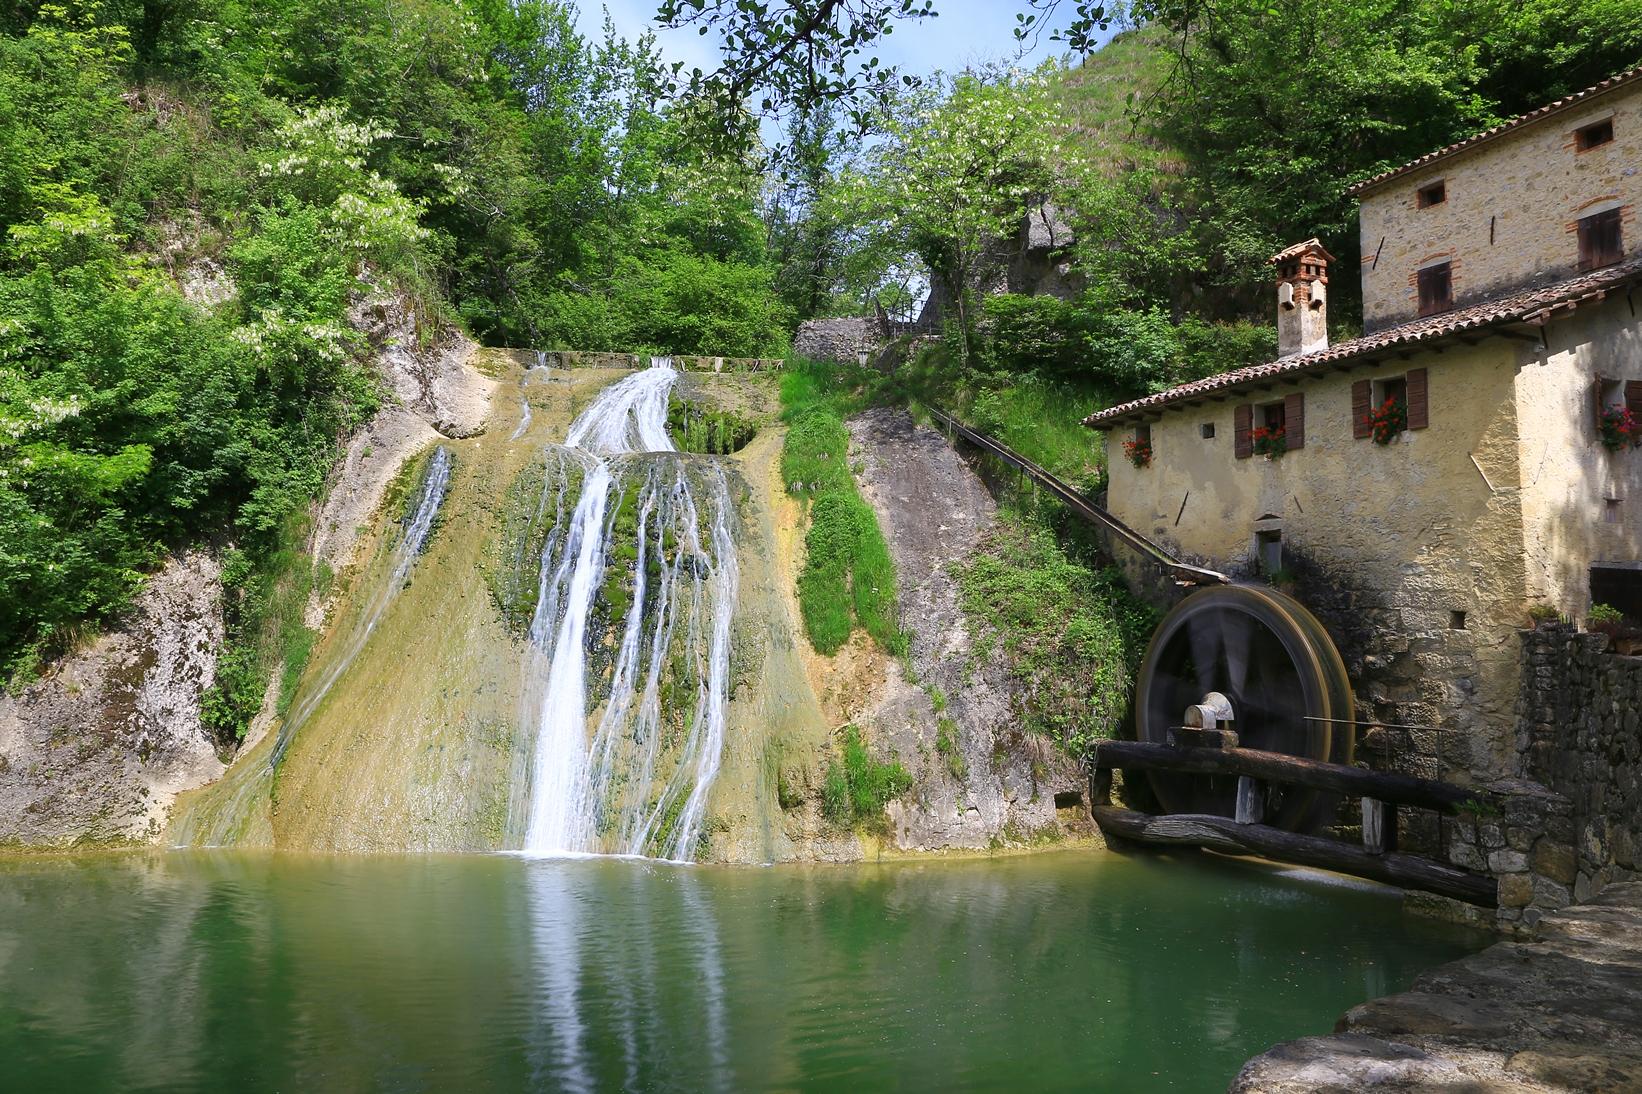 Im Prosecco-Gebiet: die Mulinetto de la Croda